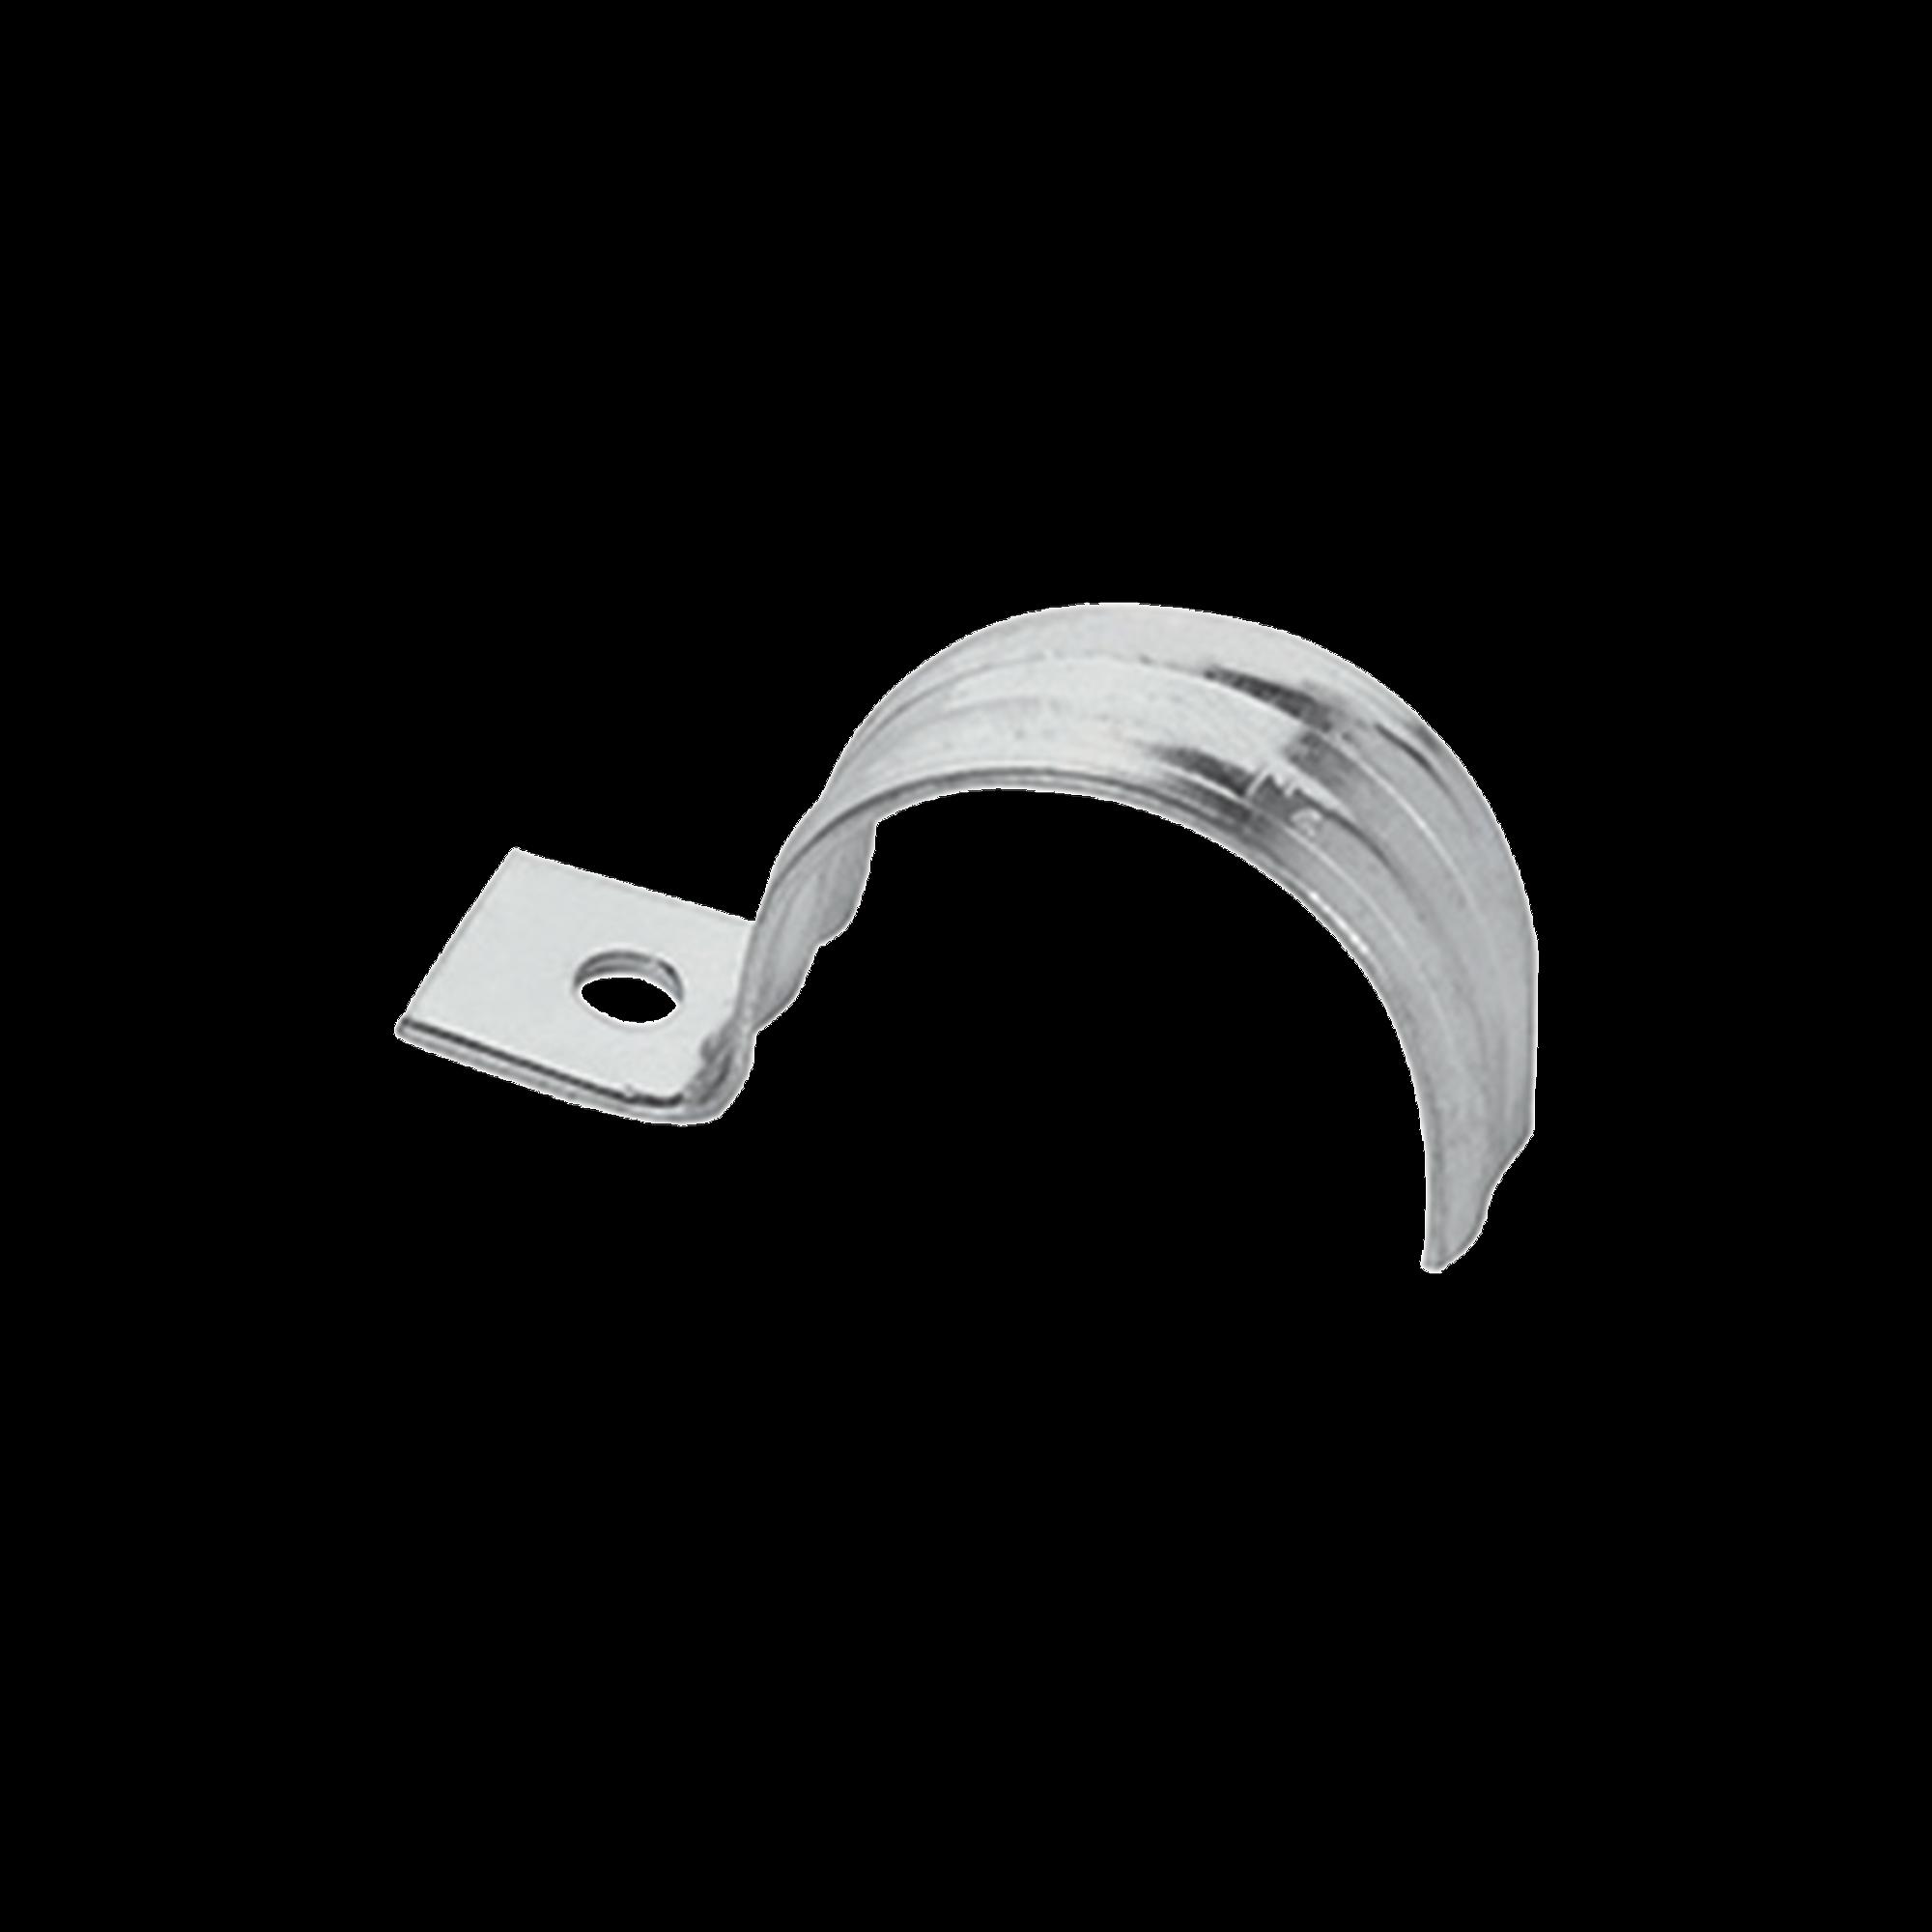 Abrazadera para tubo tipo uña 1 bolsa con 10 piezas